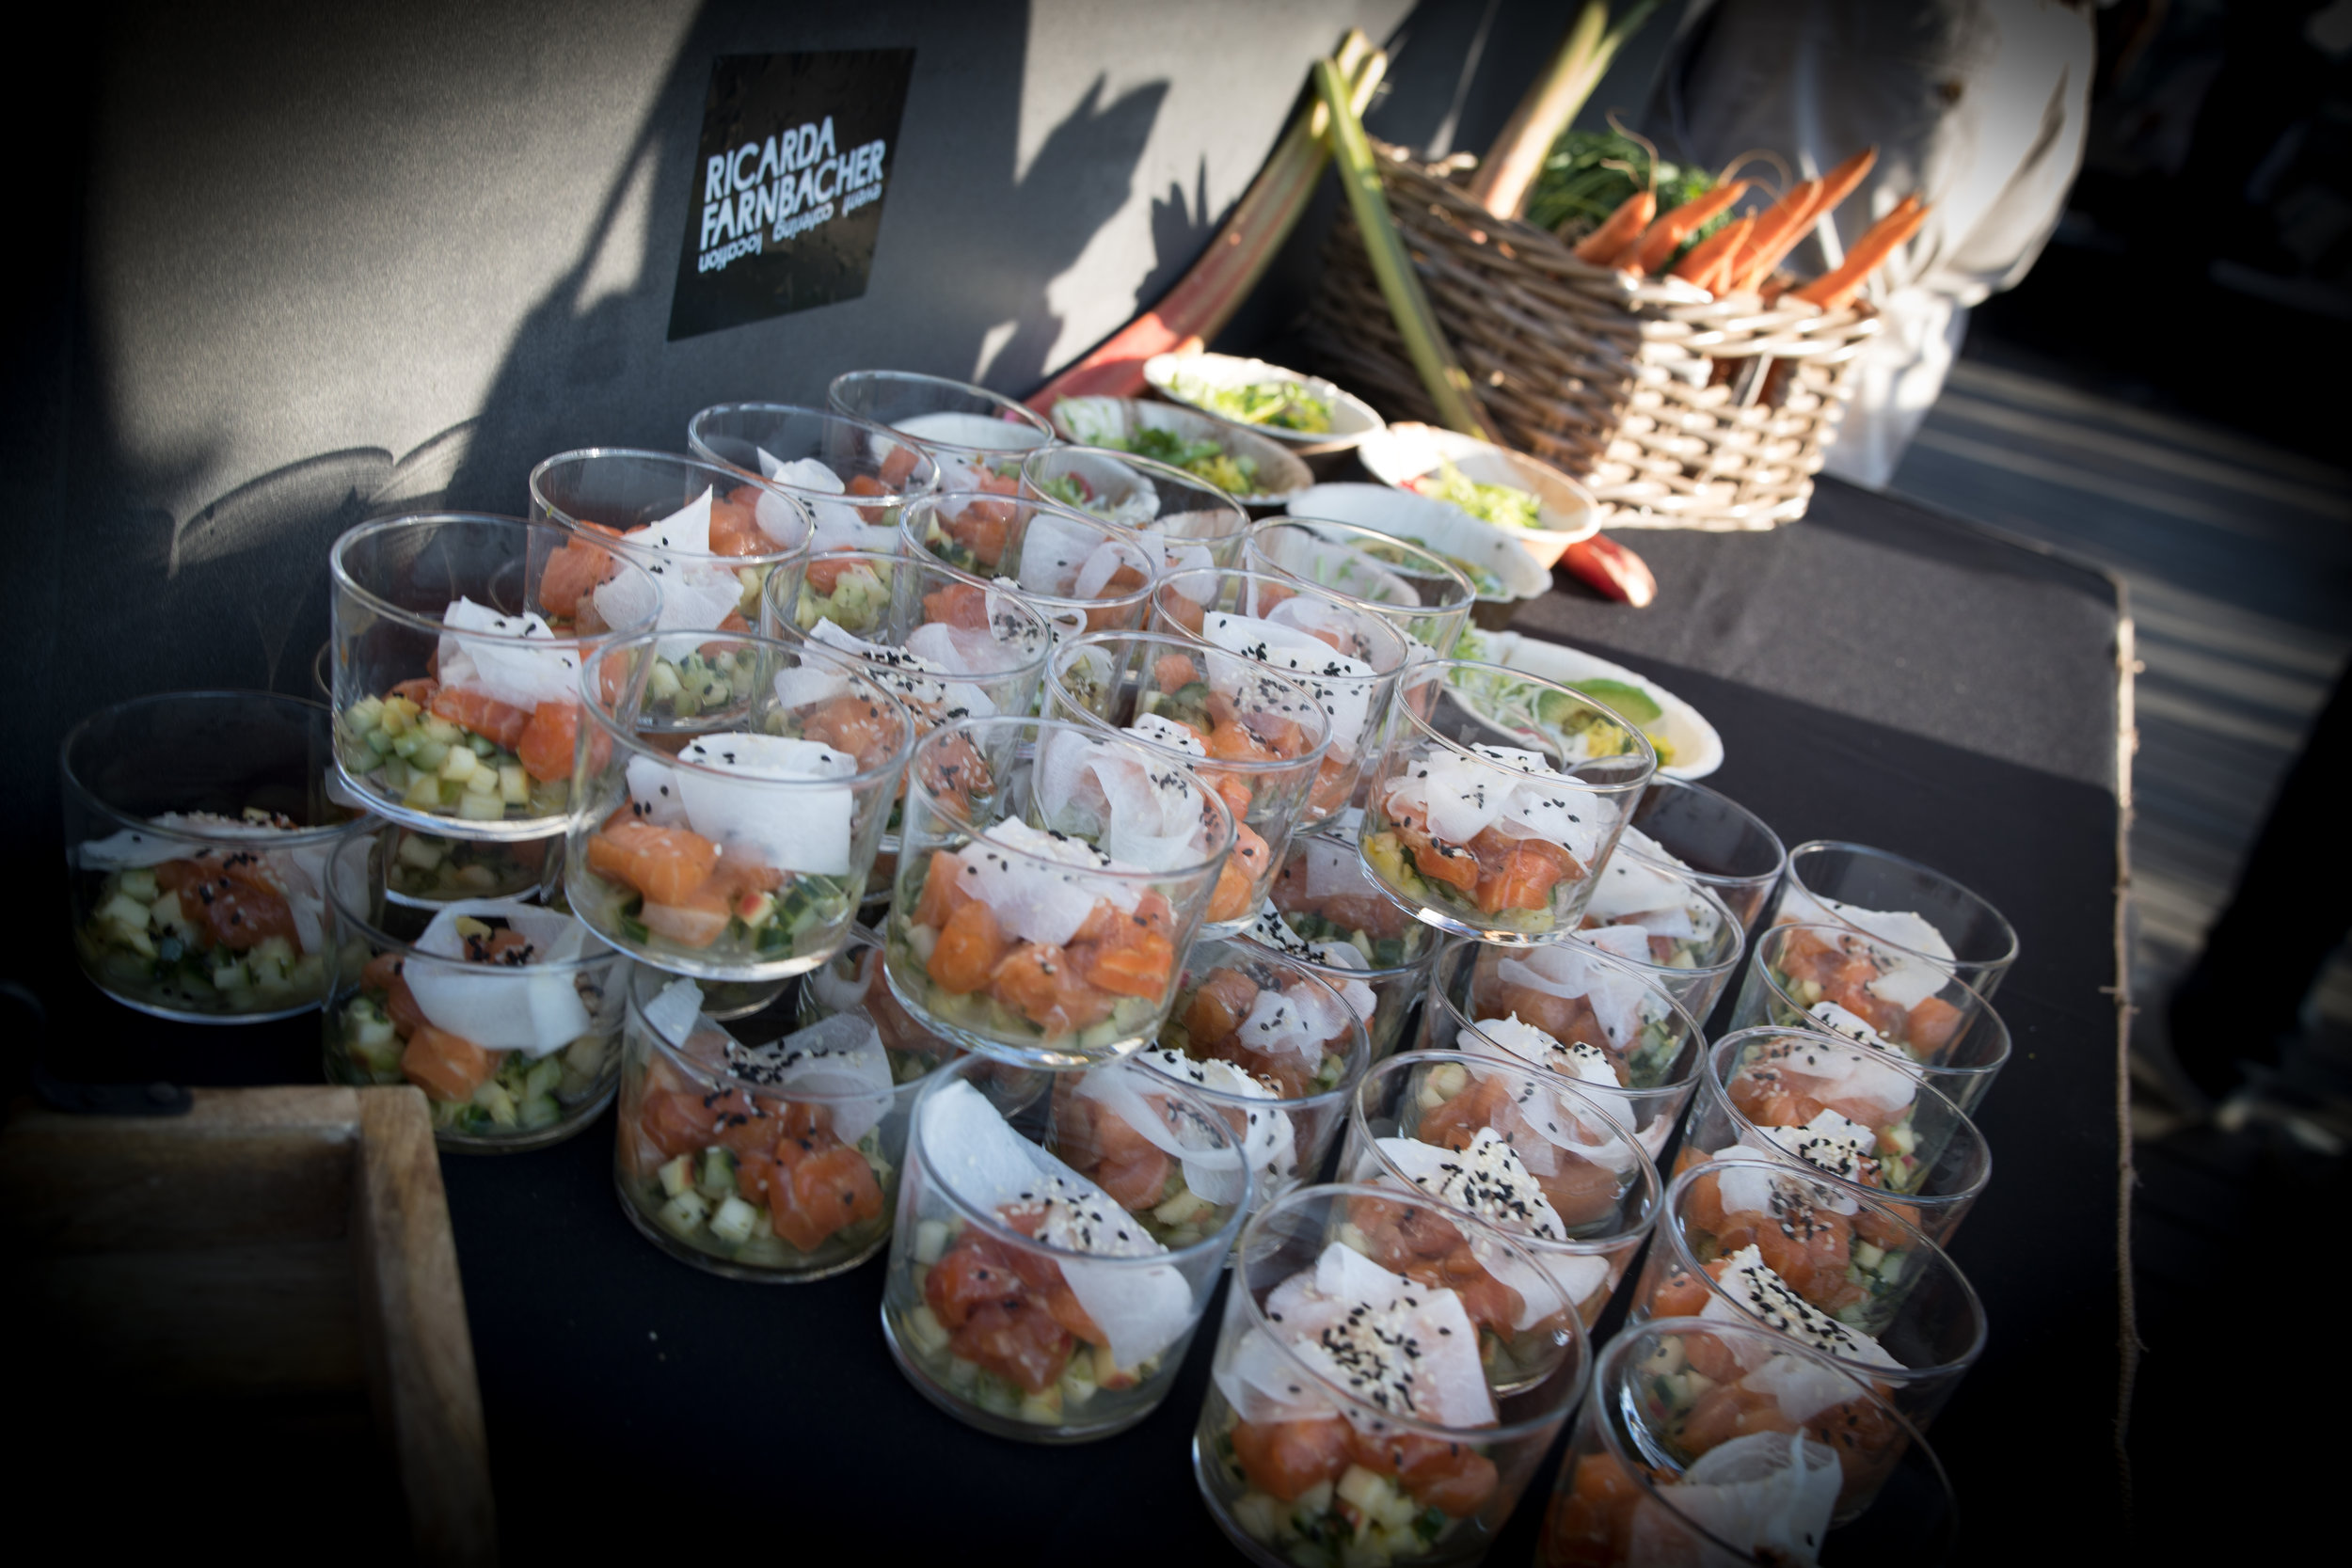 Food by Ricarda Farnbacher - Buffet Rooftop